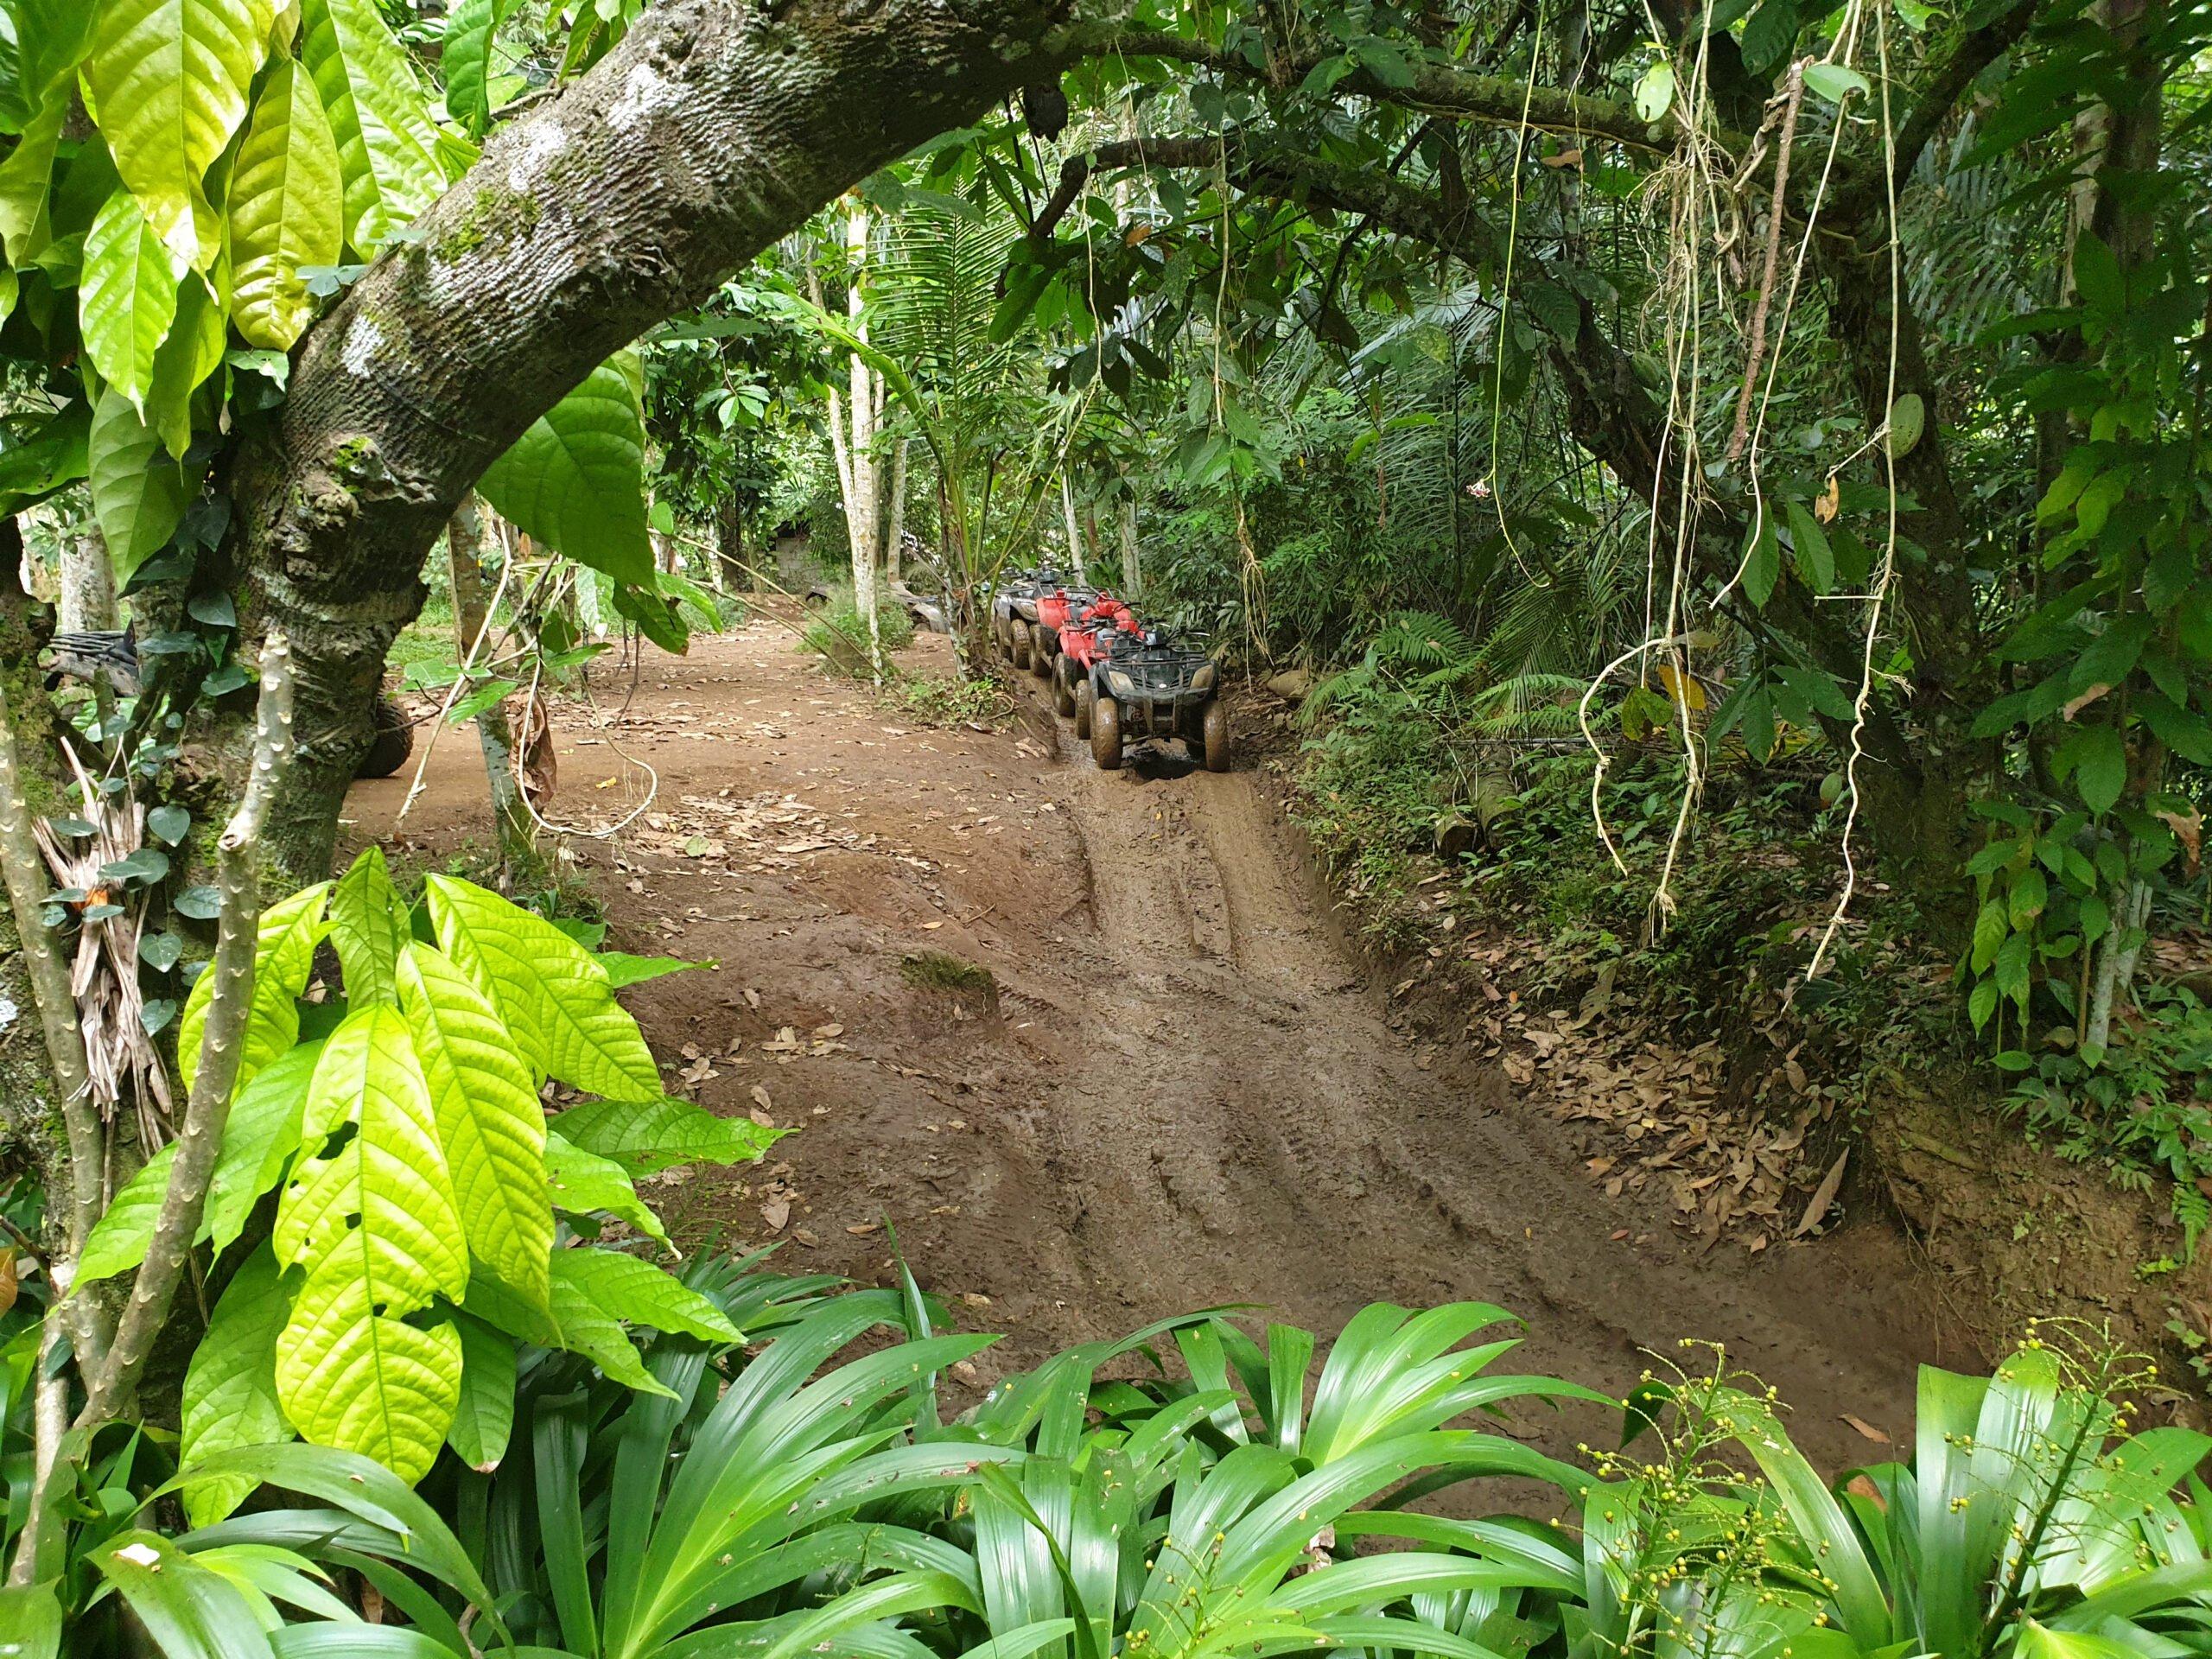 Drive On The Muddy Jungle Tracks During The Bali Atv Adventure